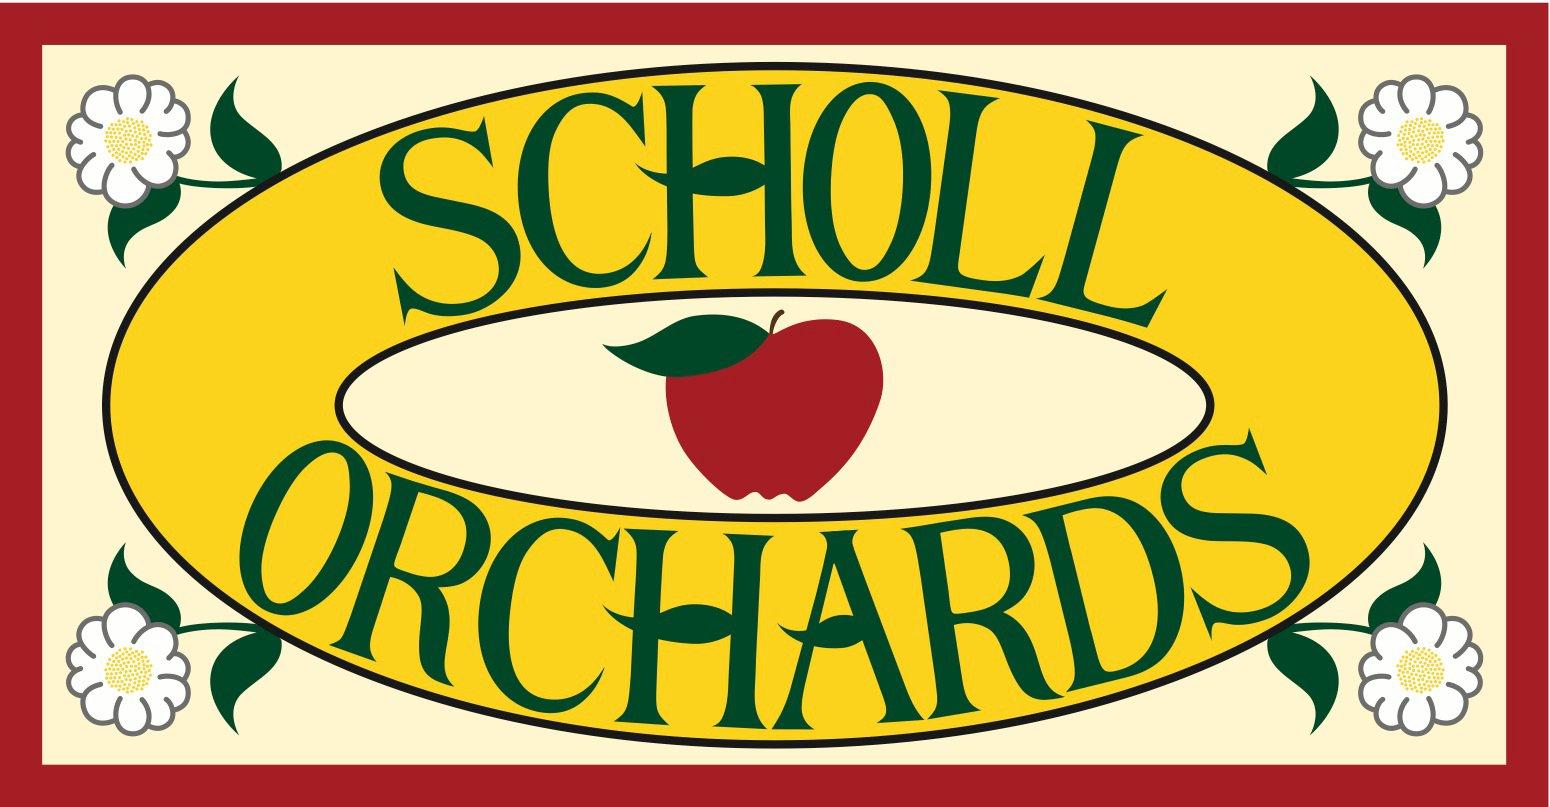 scholls orchards